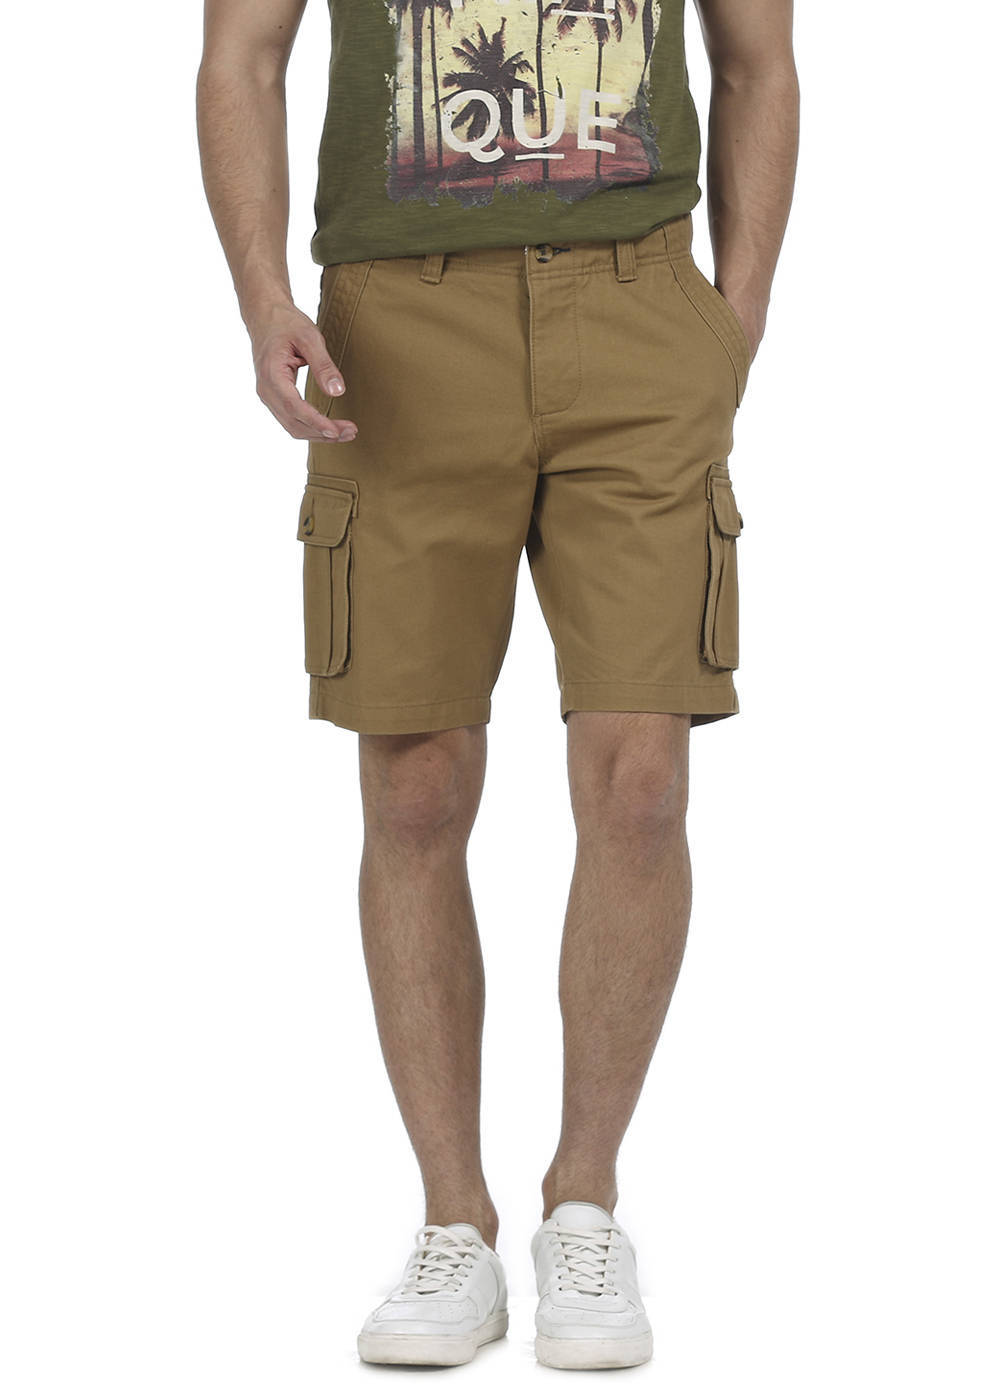 Basics   Basics Comfort Fit Bistre Khaki 6 Pocket Cargo Shorts